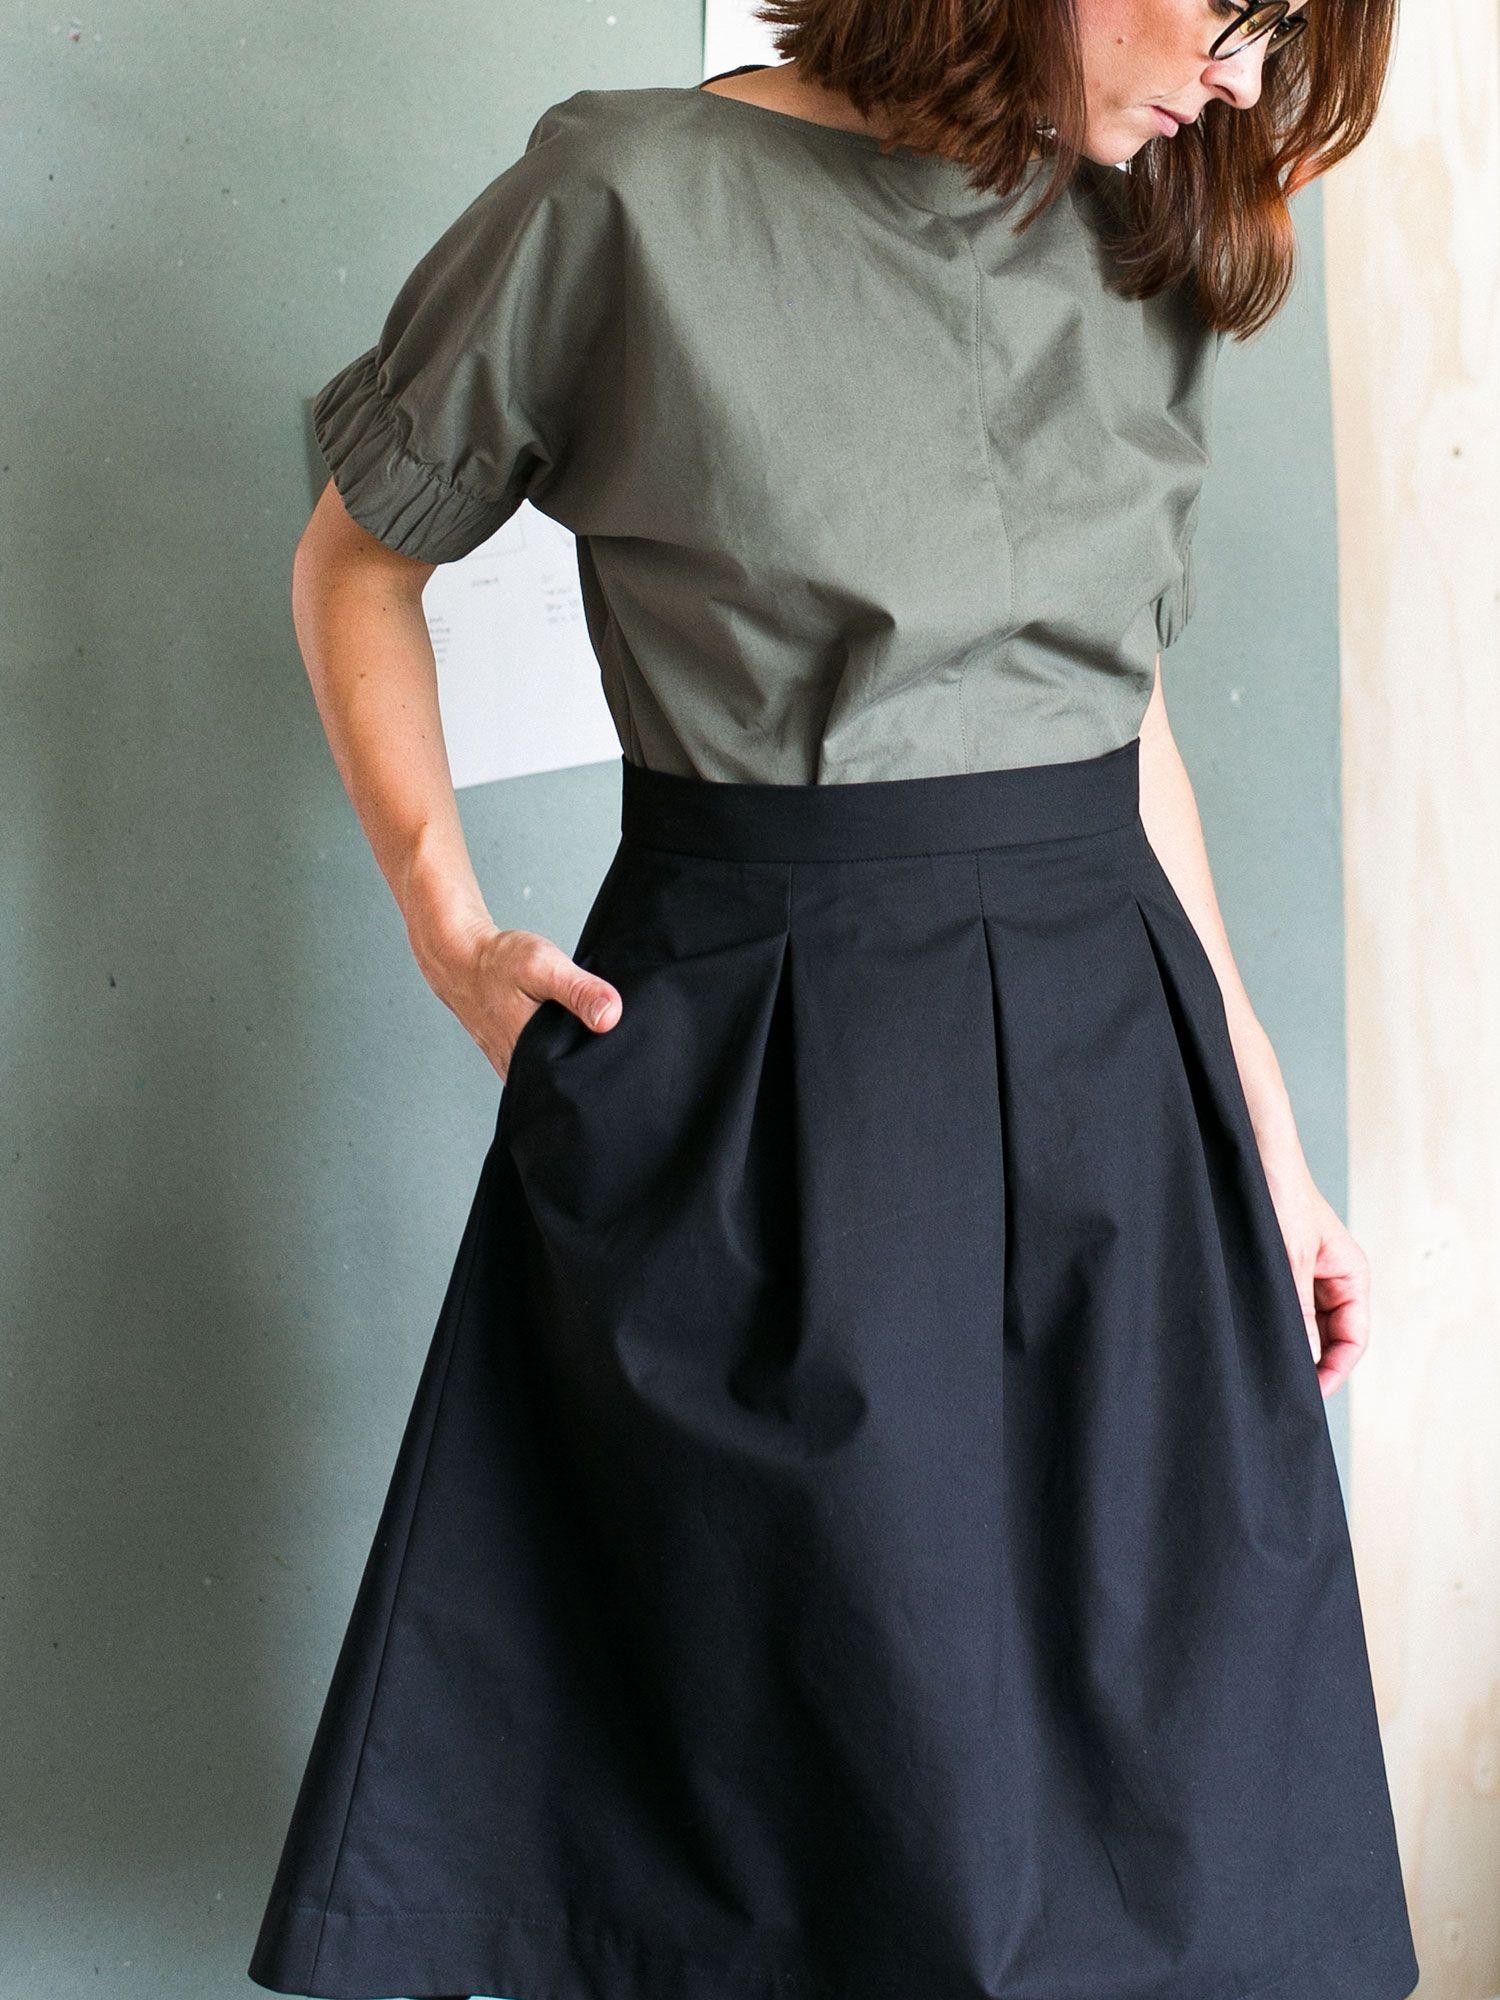 Three pleat skirt pattern | Pinterest | Freebooks, Schnittmuster und ...